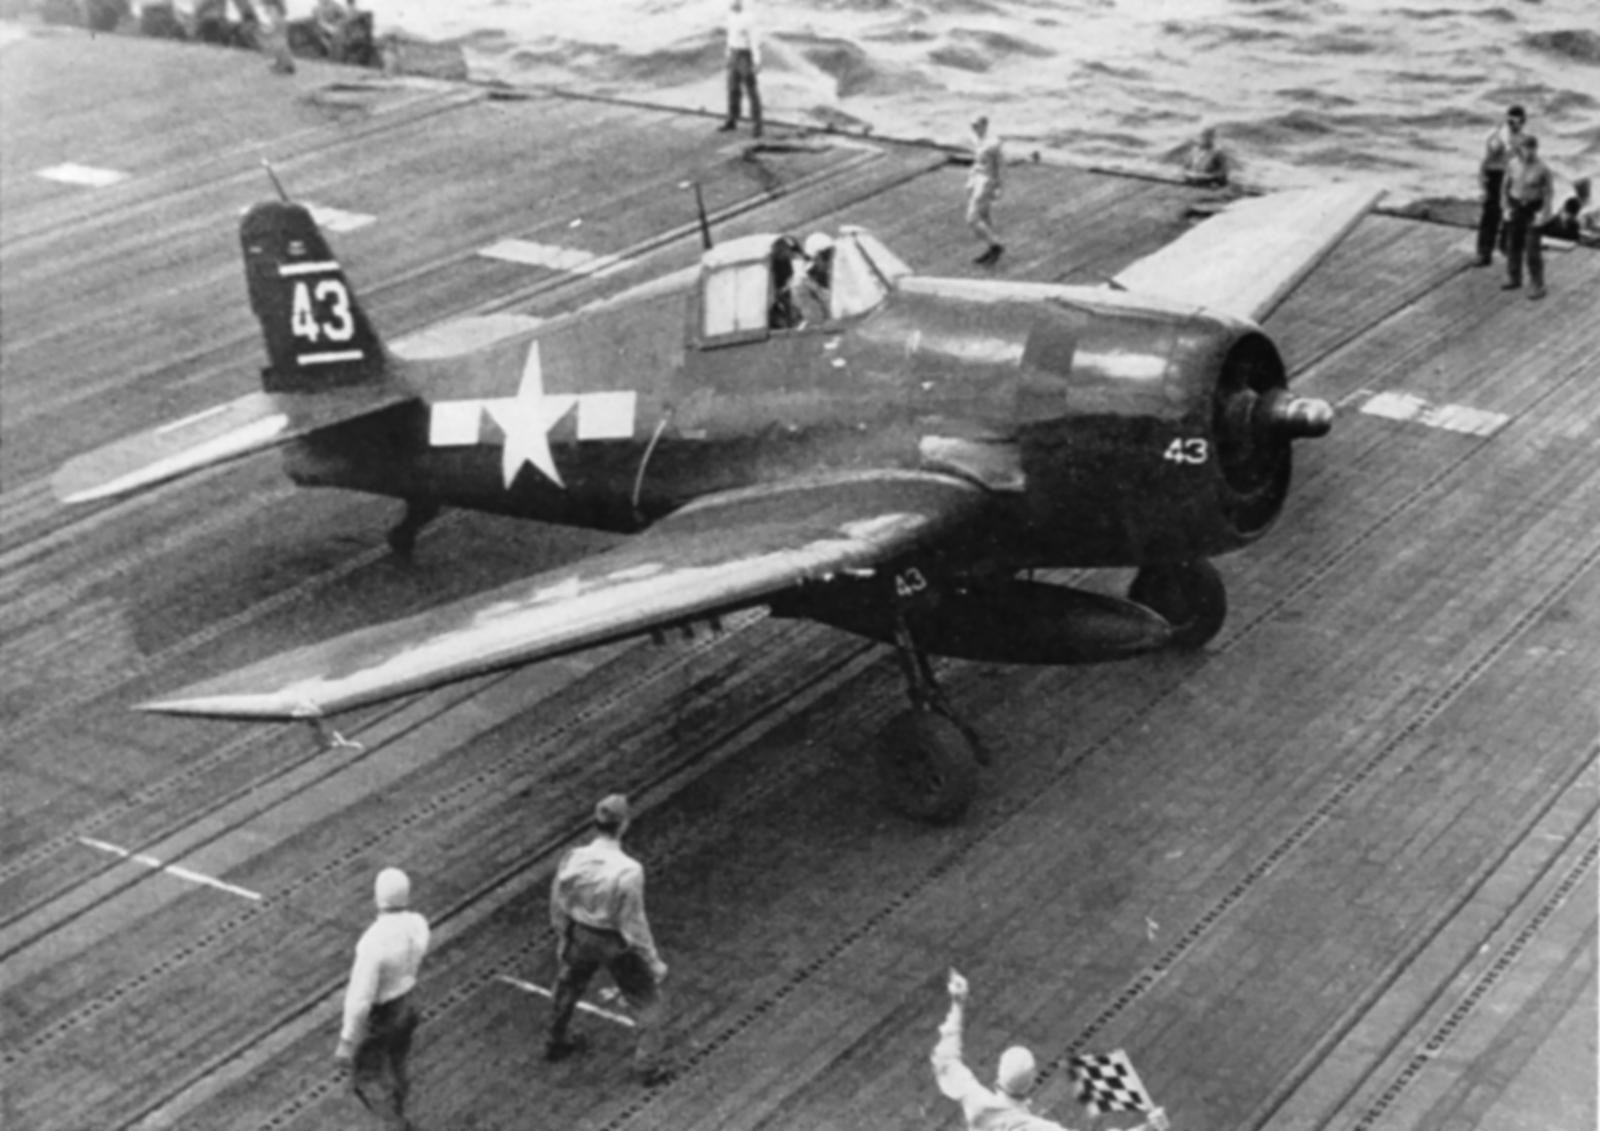 Grumman F6F 3 Hellcat VF 8 White 43 aboard CV 17 USS Bunker Hill off Saipan 01